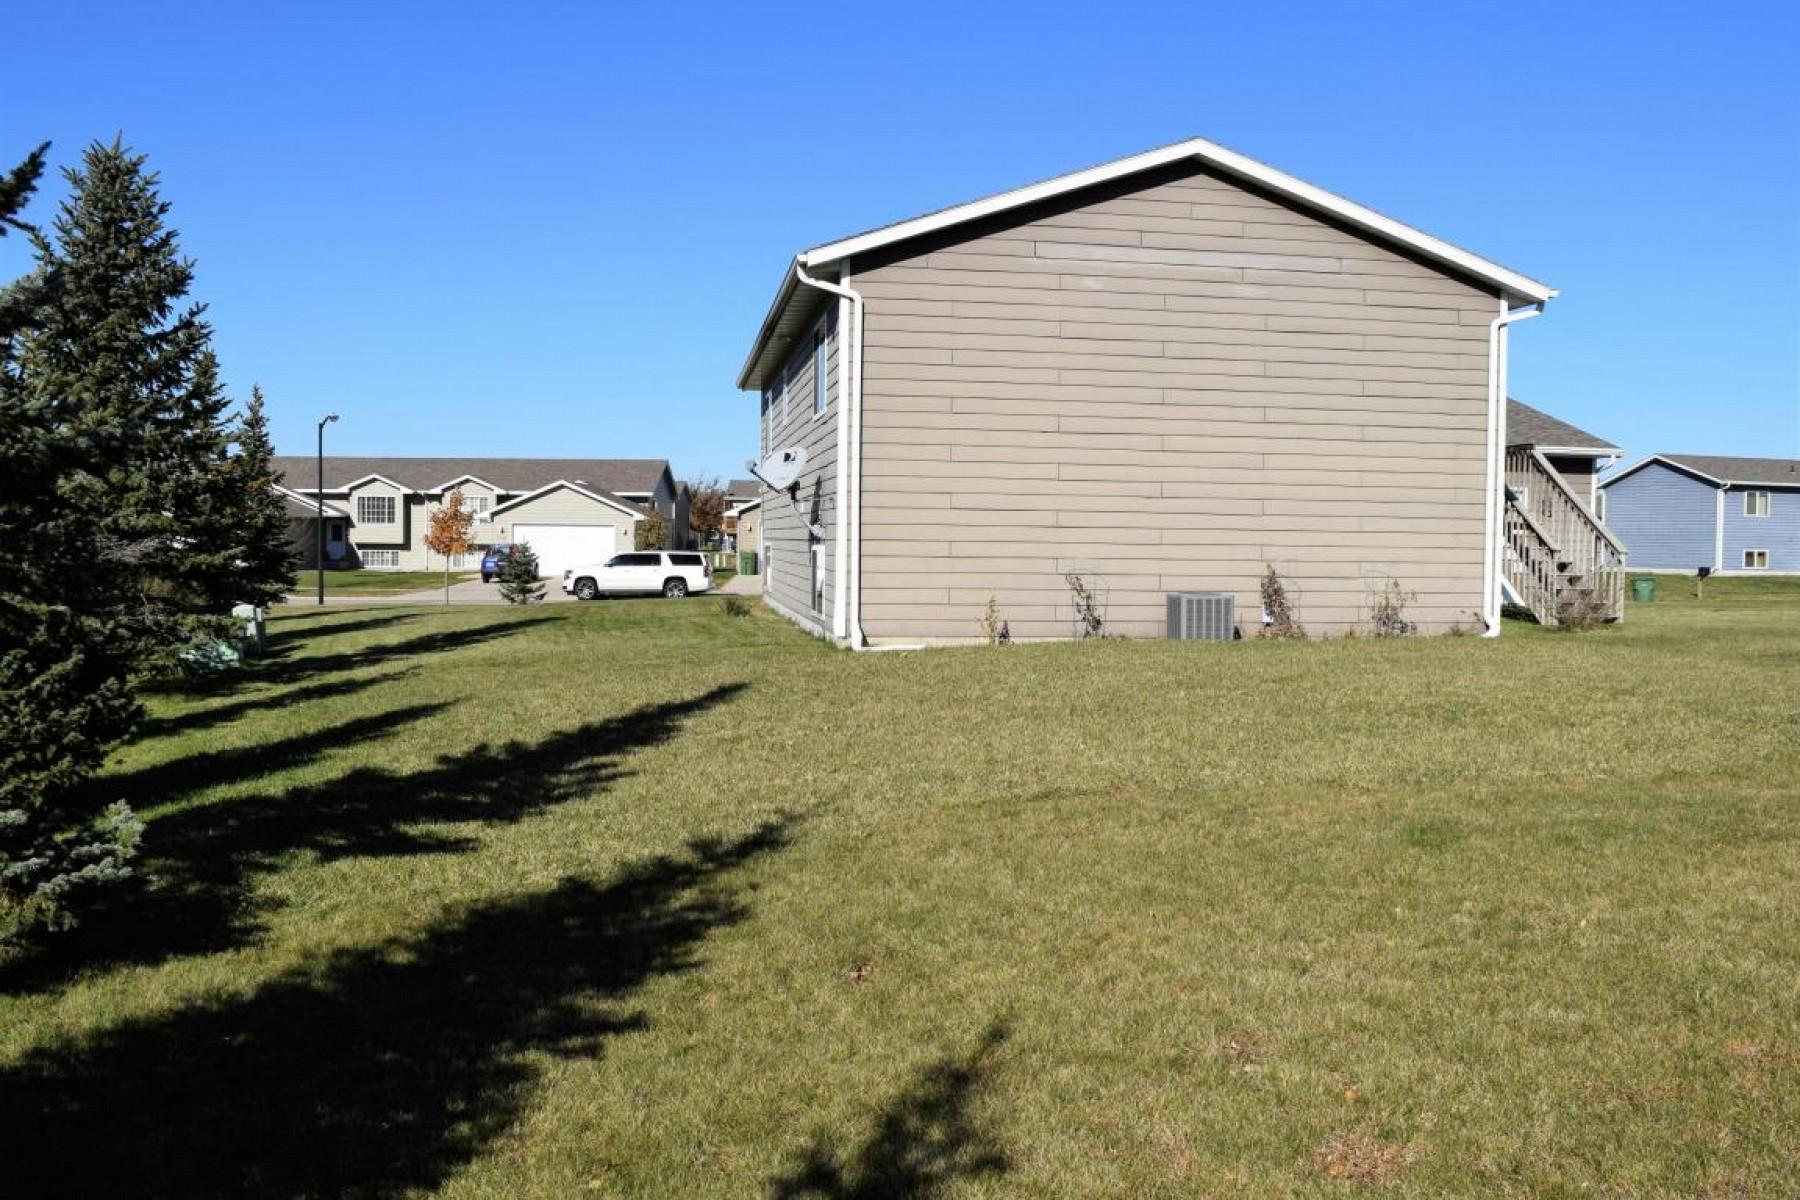 1327 SawgrassDrive, Brookings, SD 57006